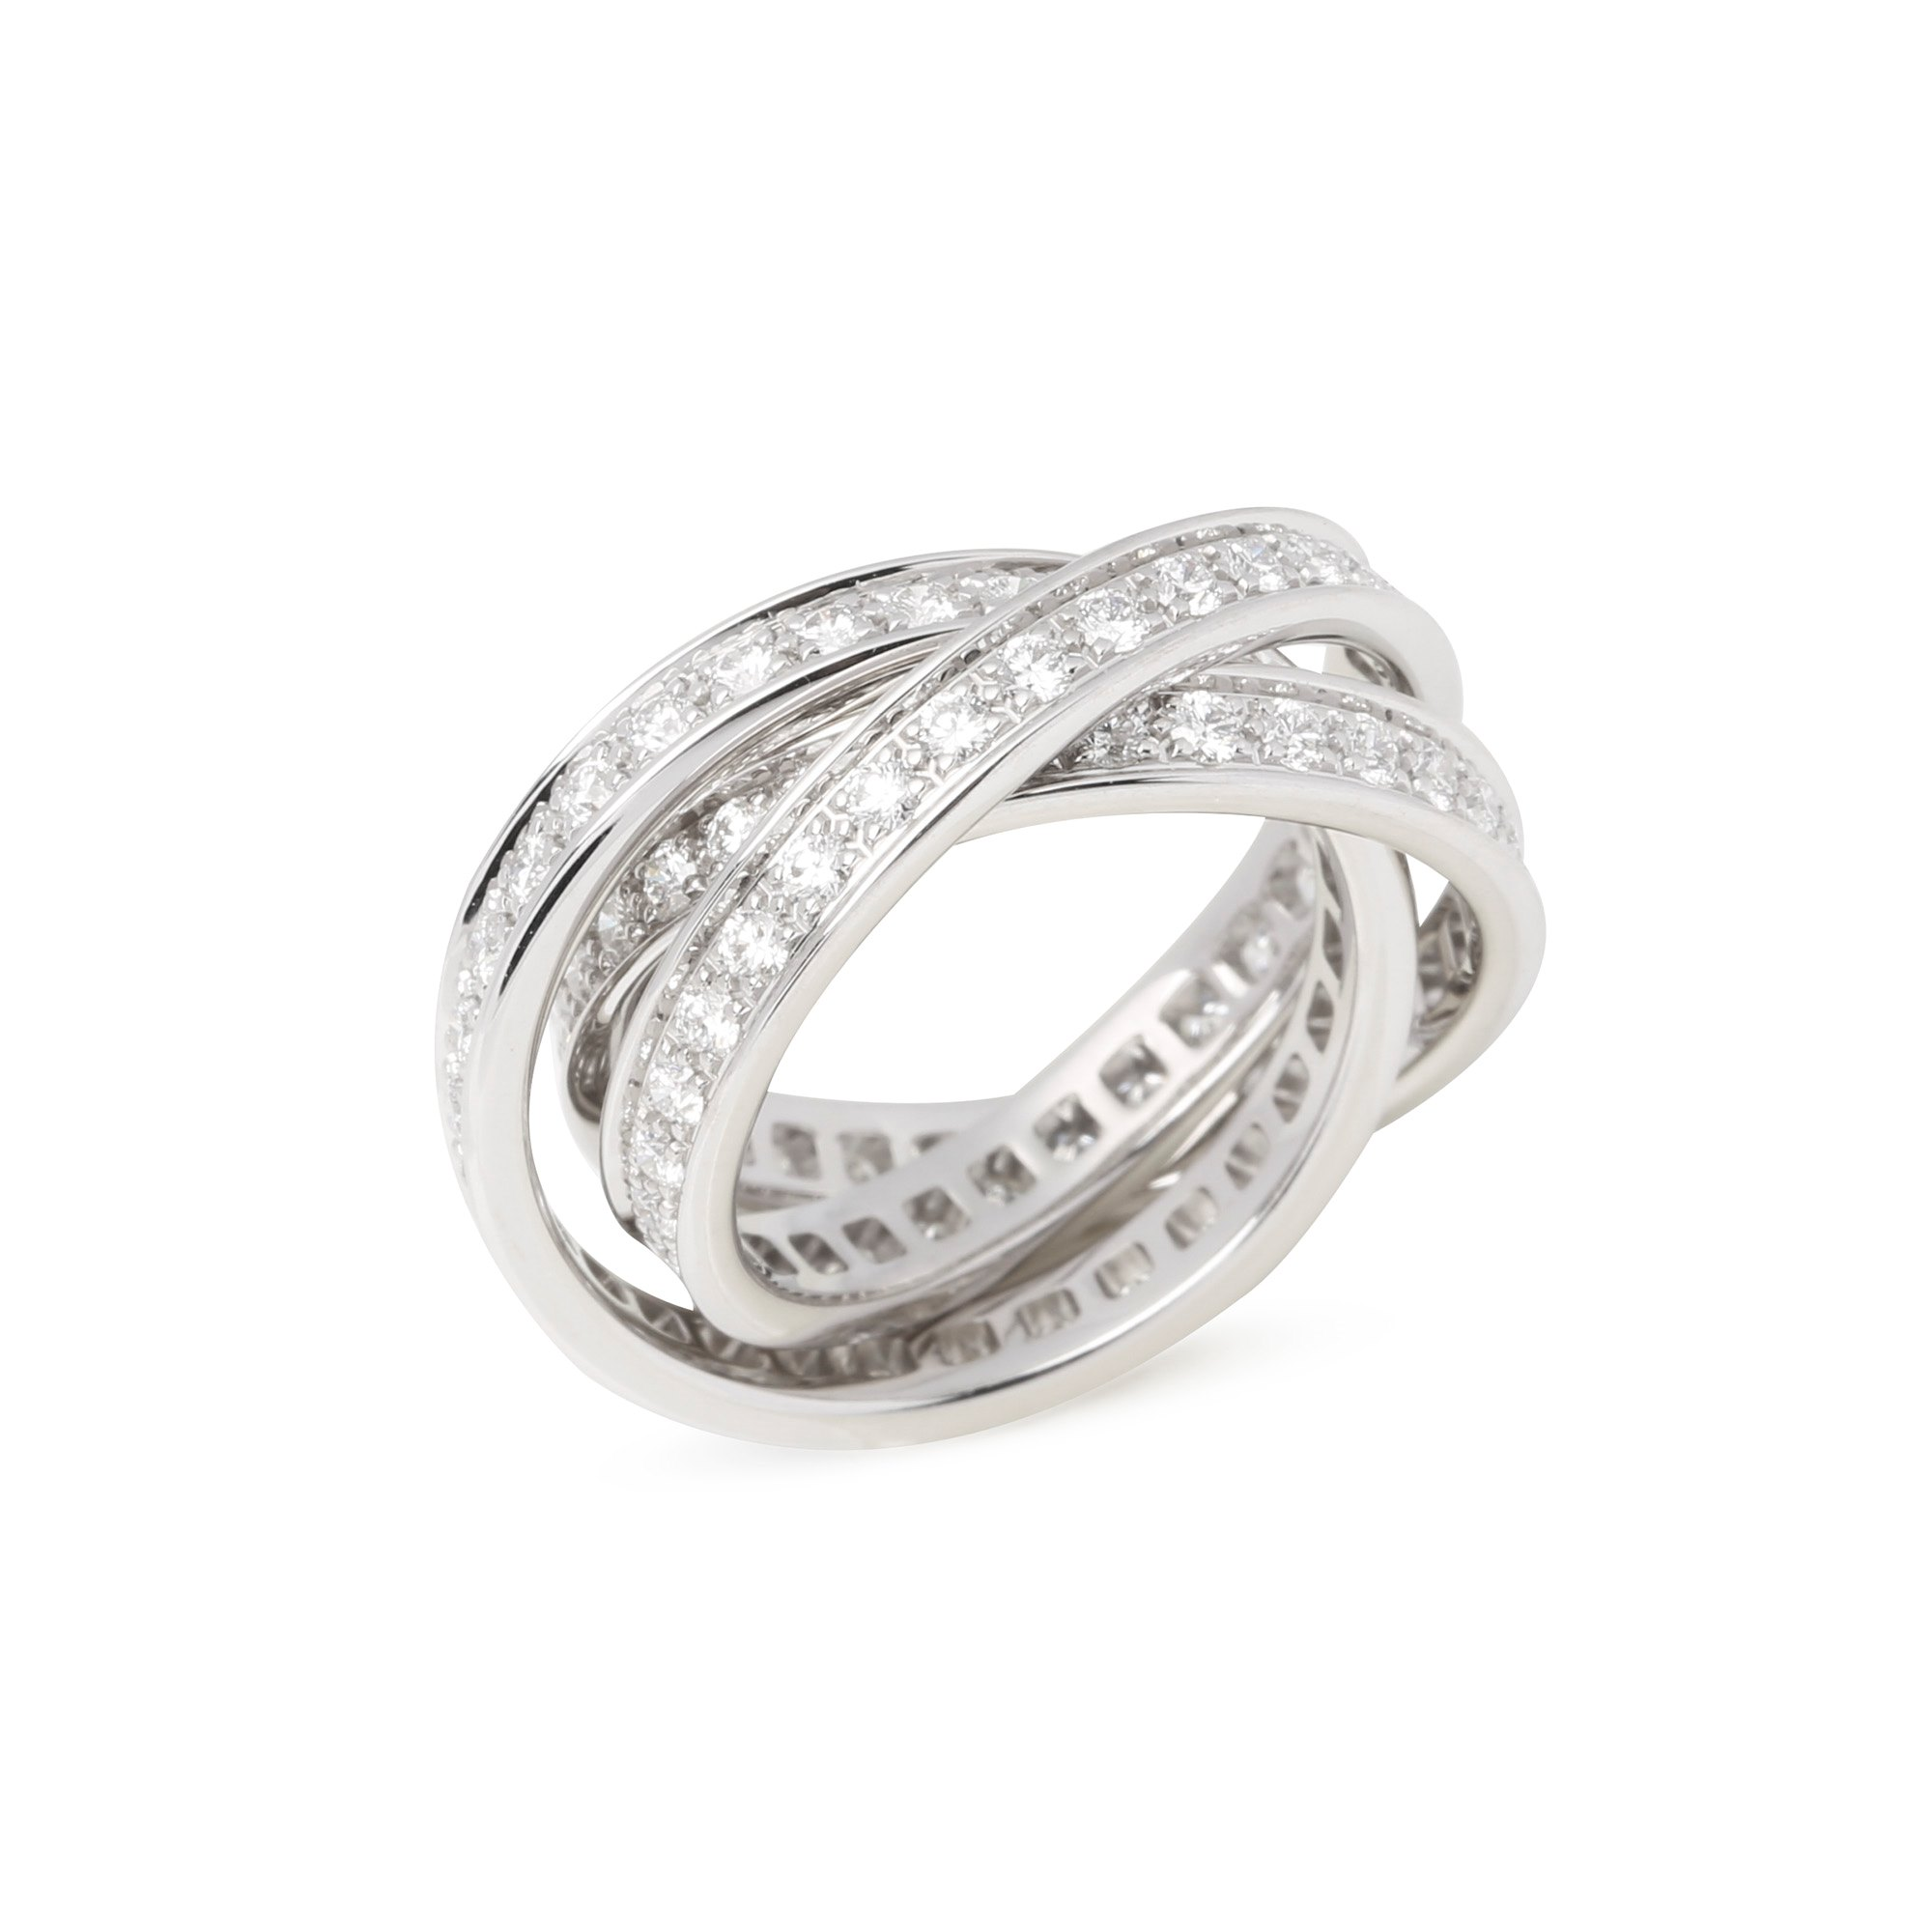 Cartier Trinity Full Diamond Ring